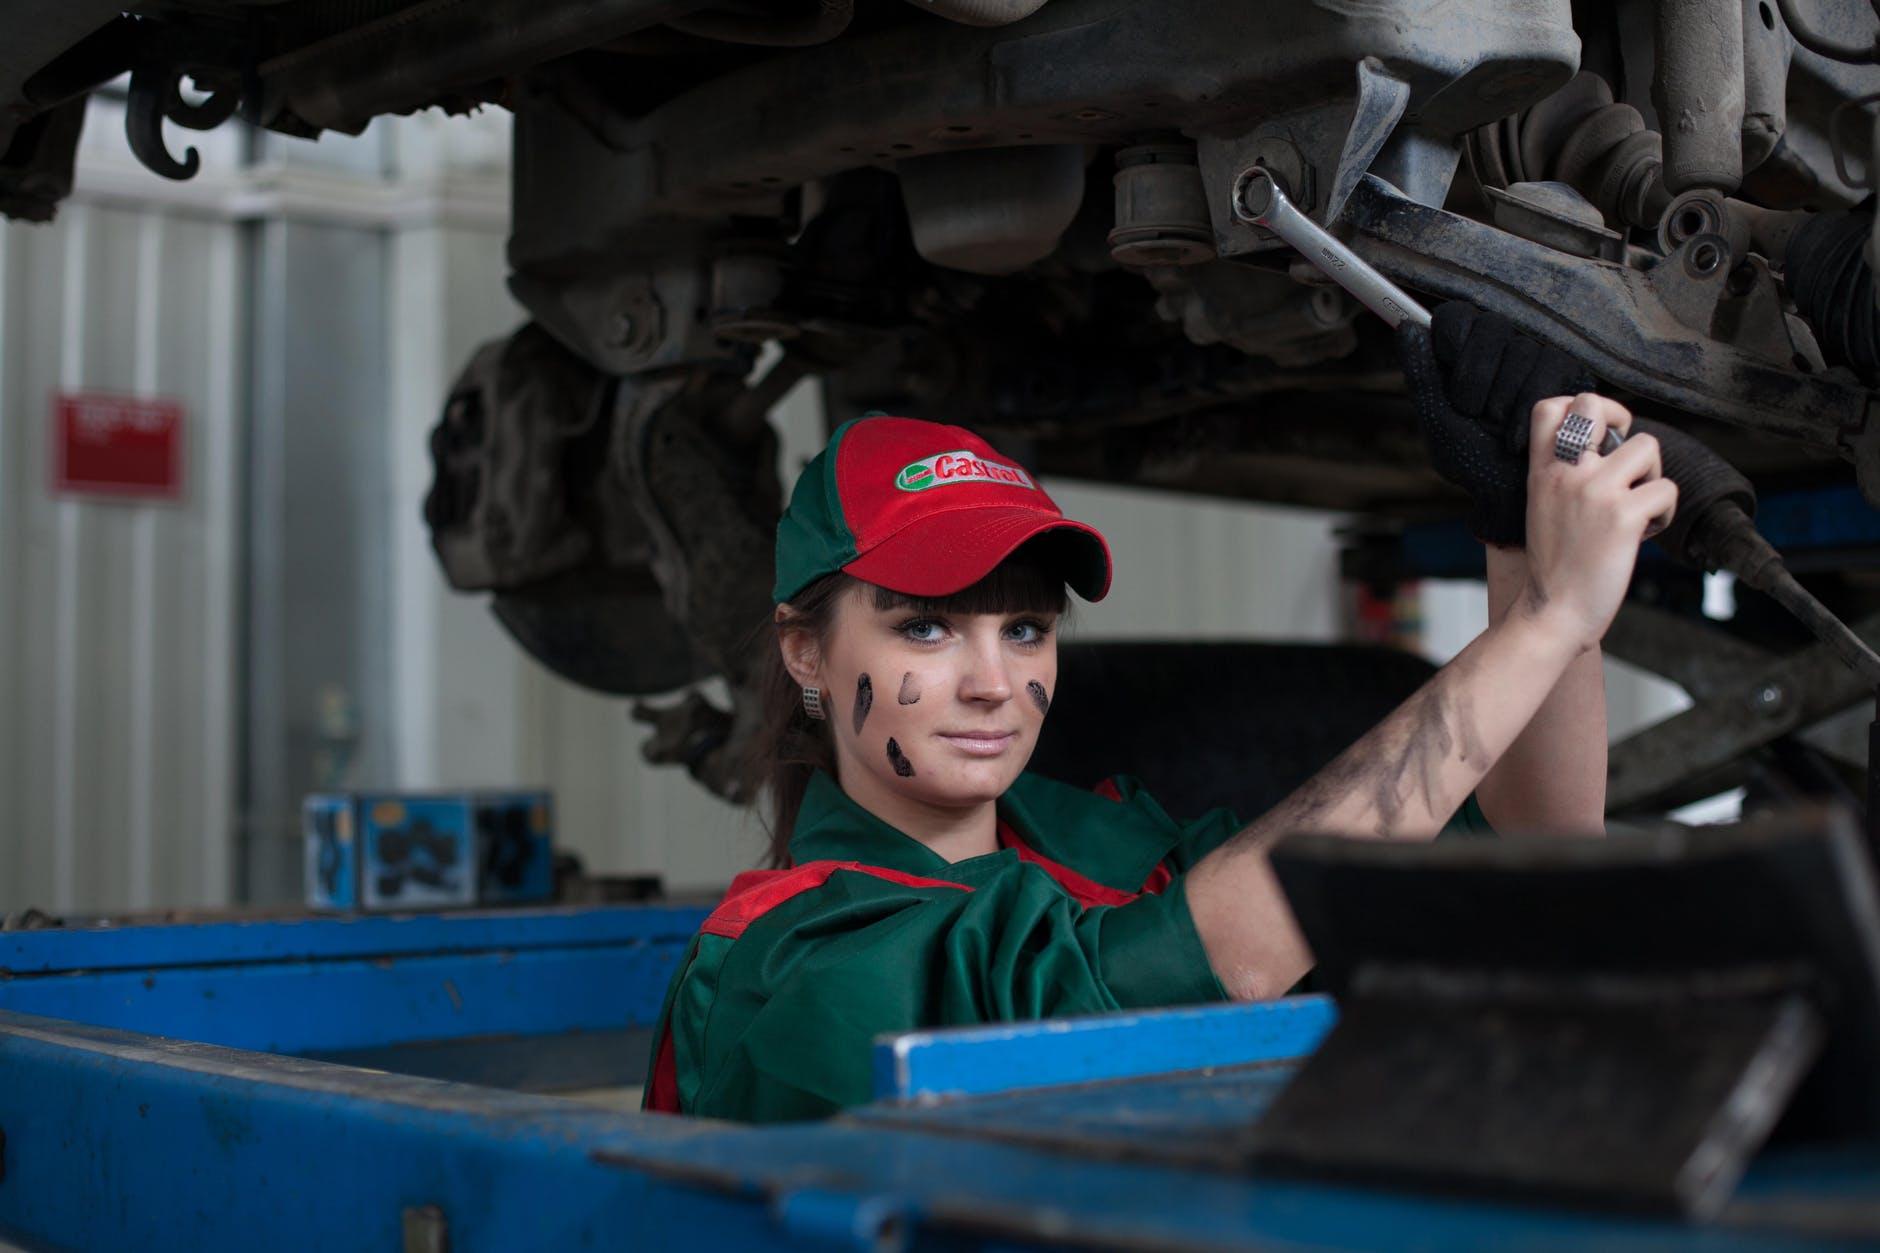 Automechanik